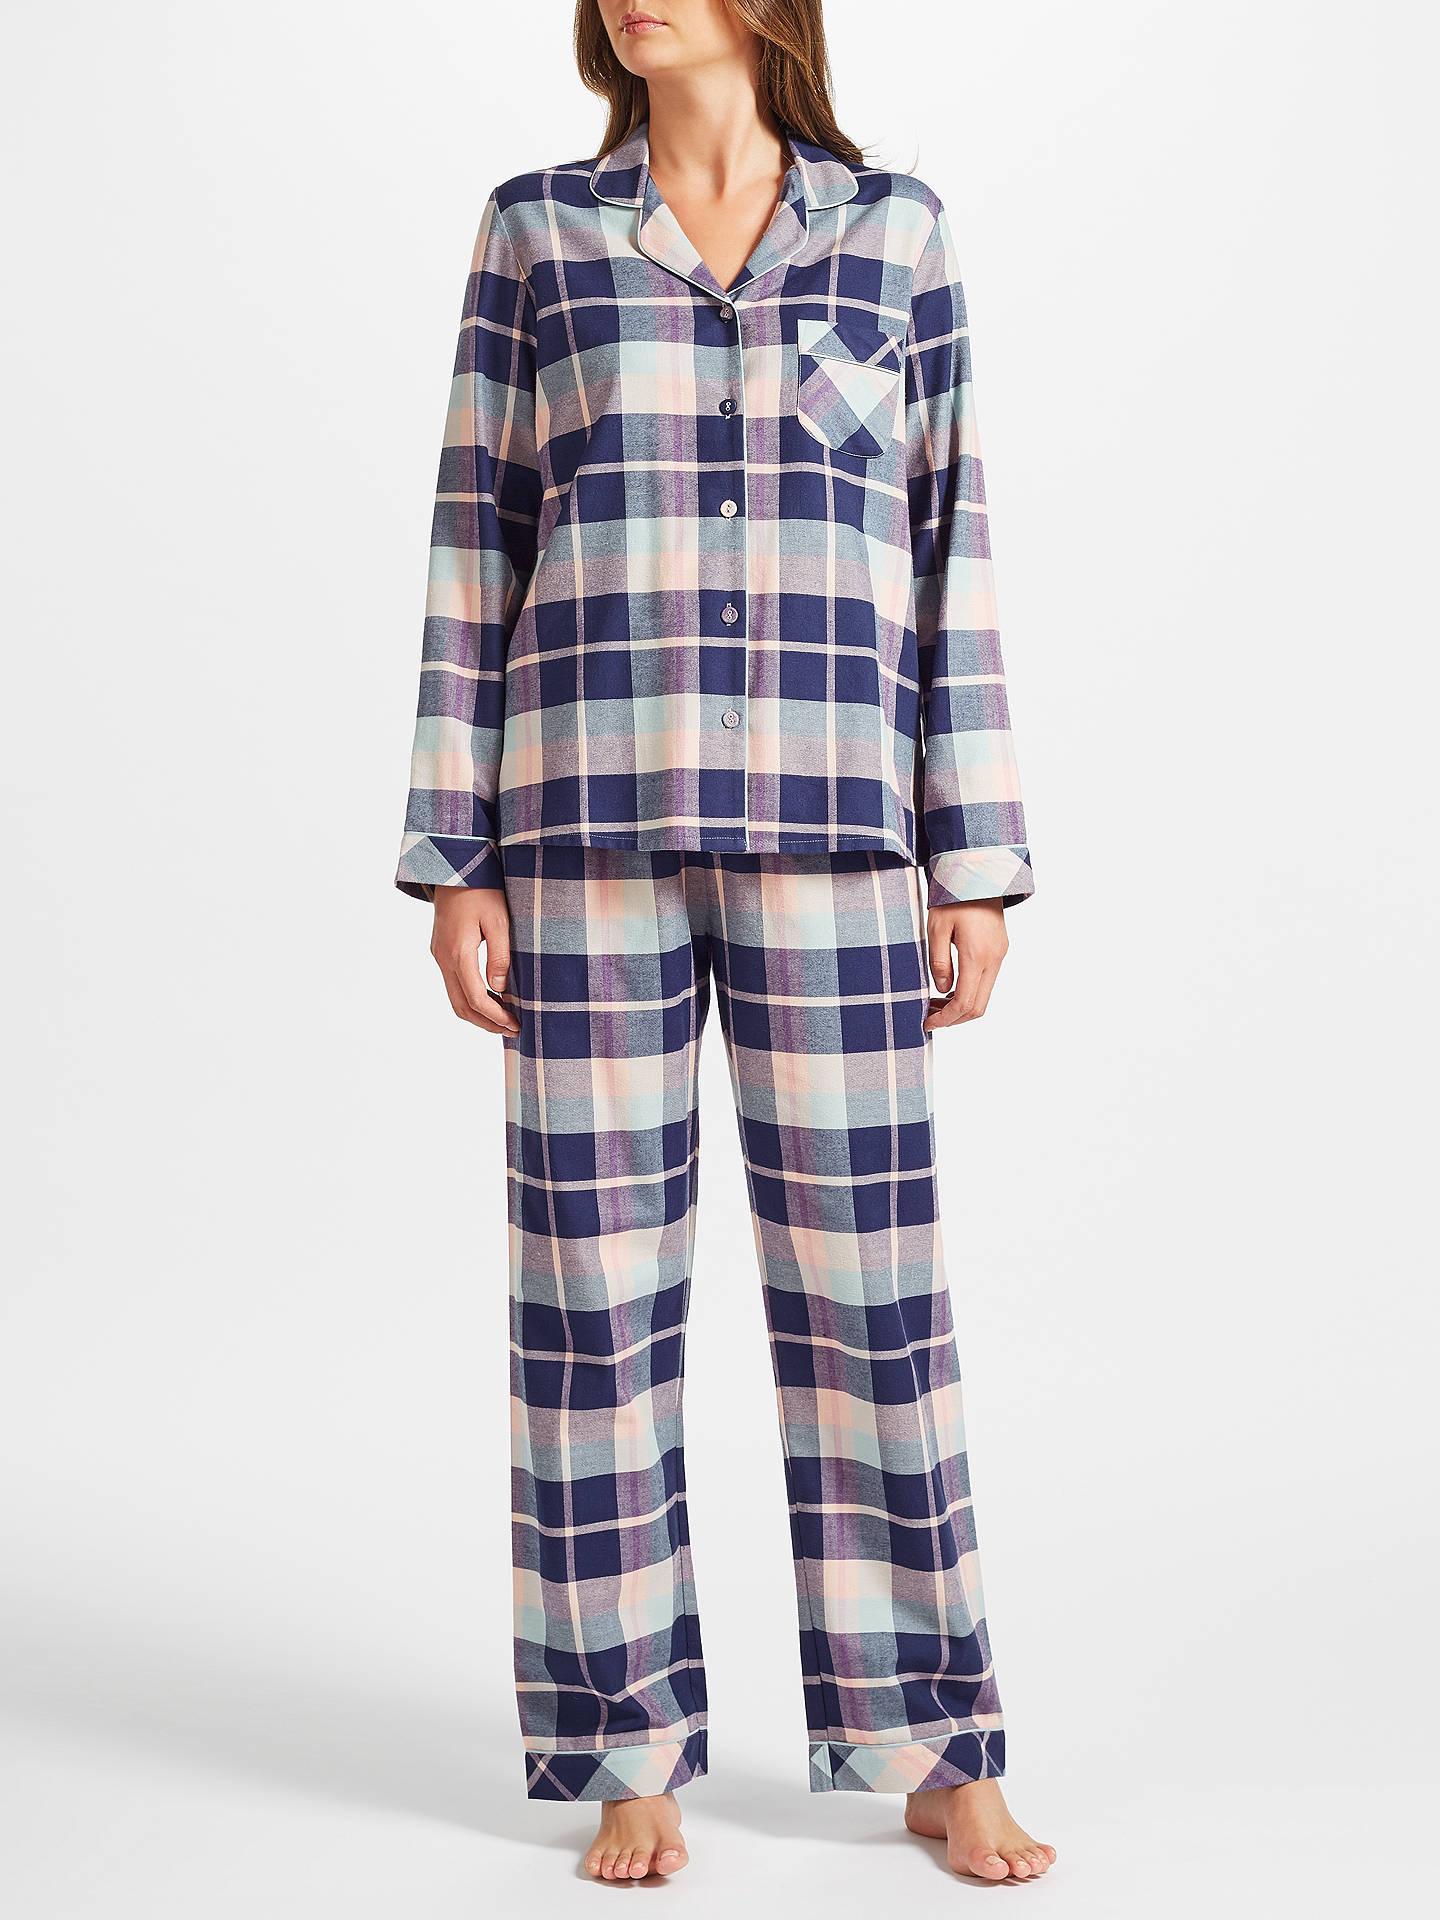 BuyJohn Lewis Hannah Check Pyjama Set 1e56a4920